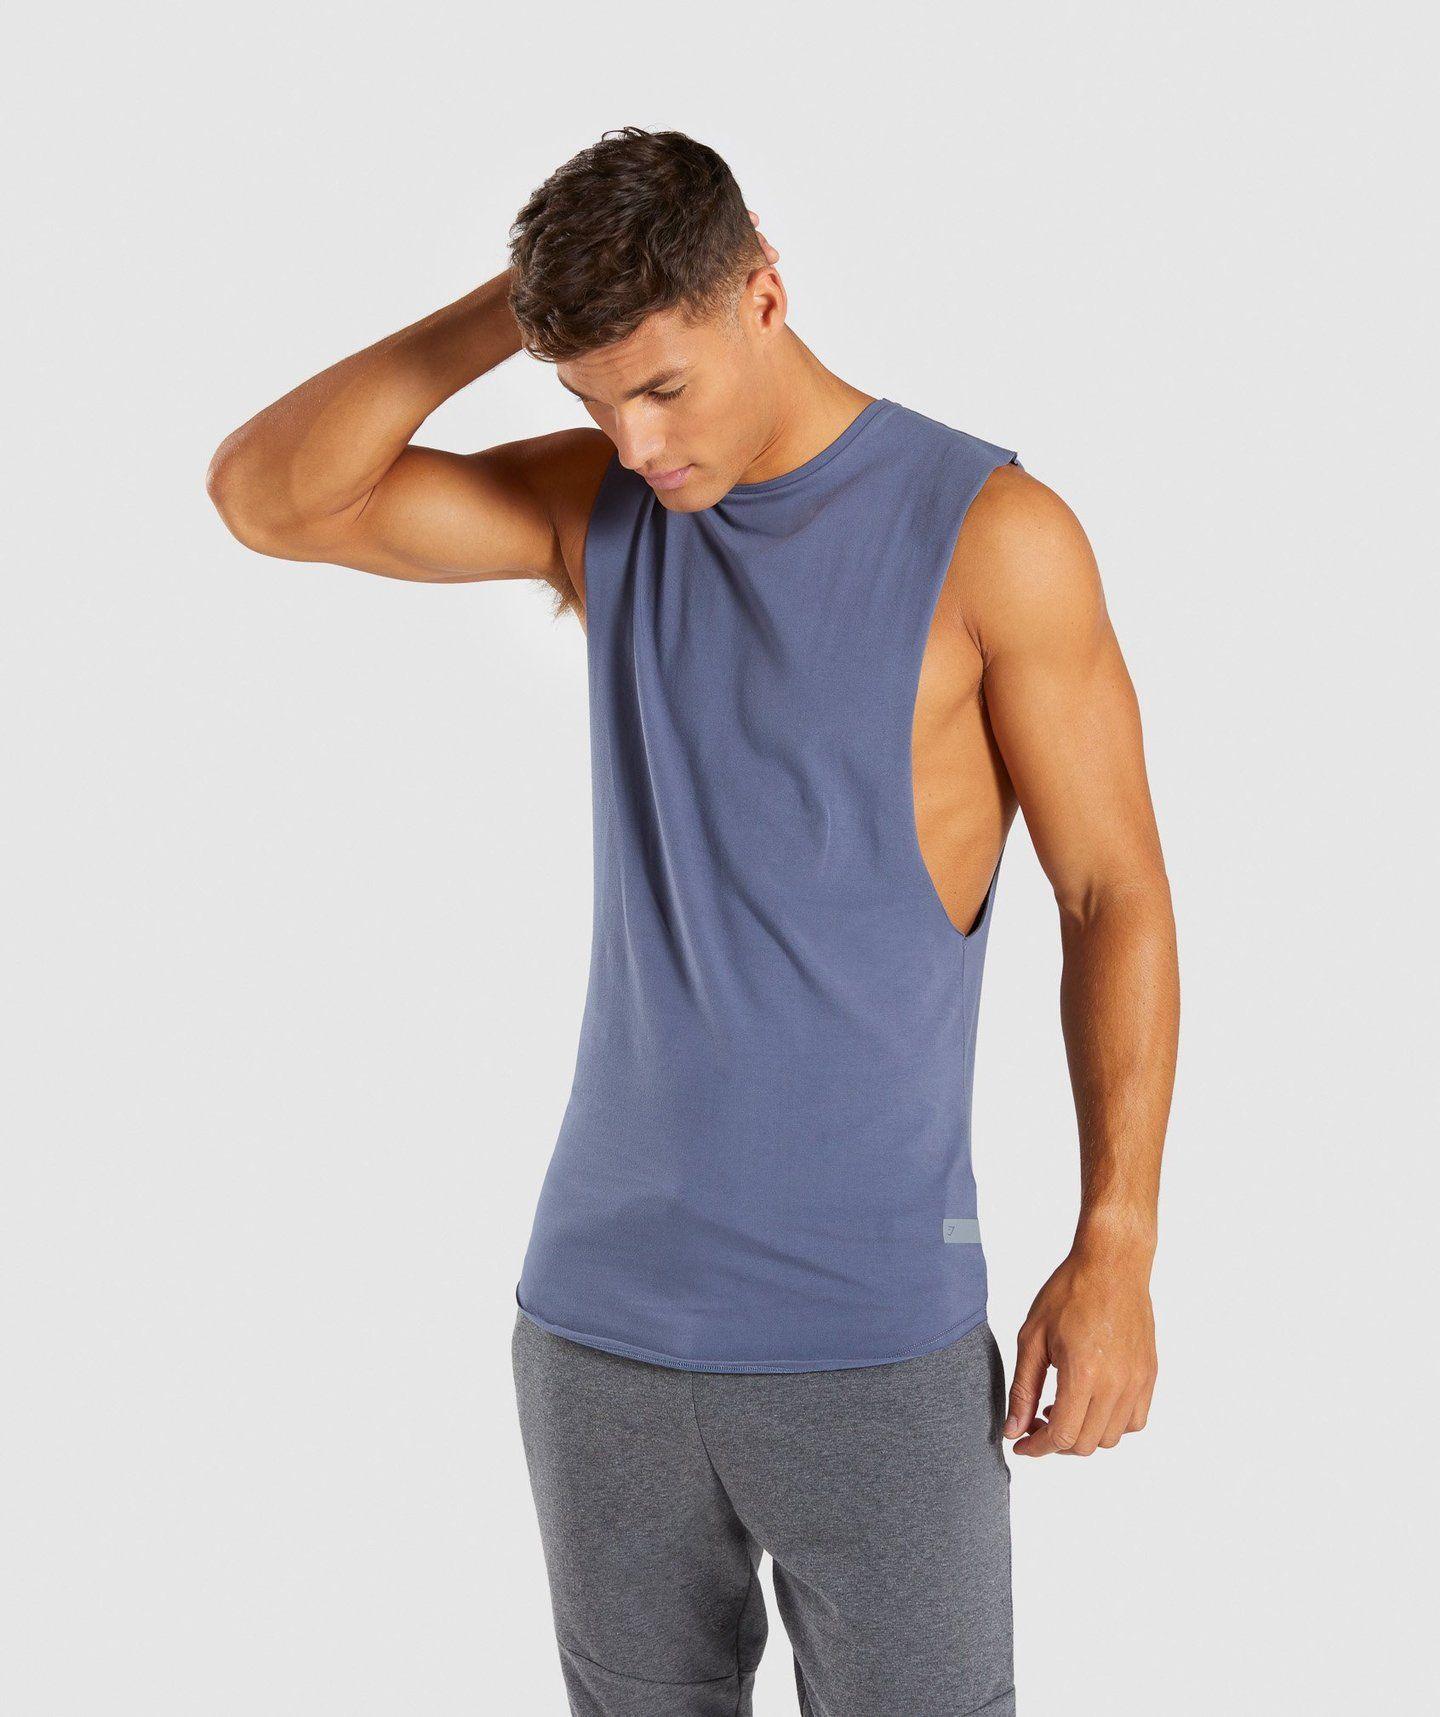 76ead550f Gymshark Eaze Drop Arm Sleeveless T-Shirt - Aegean Blue 4